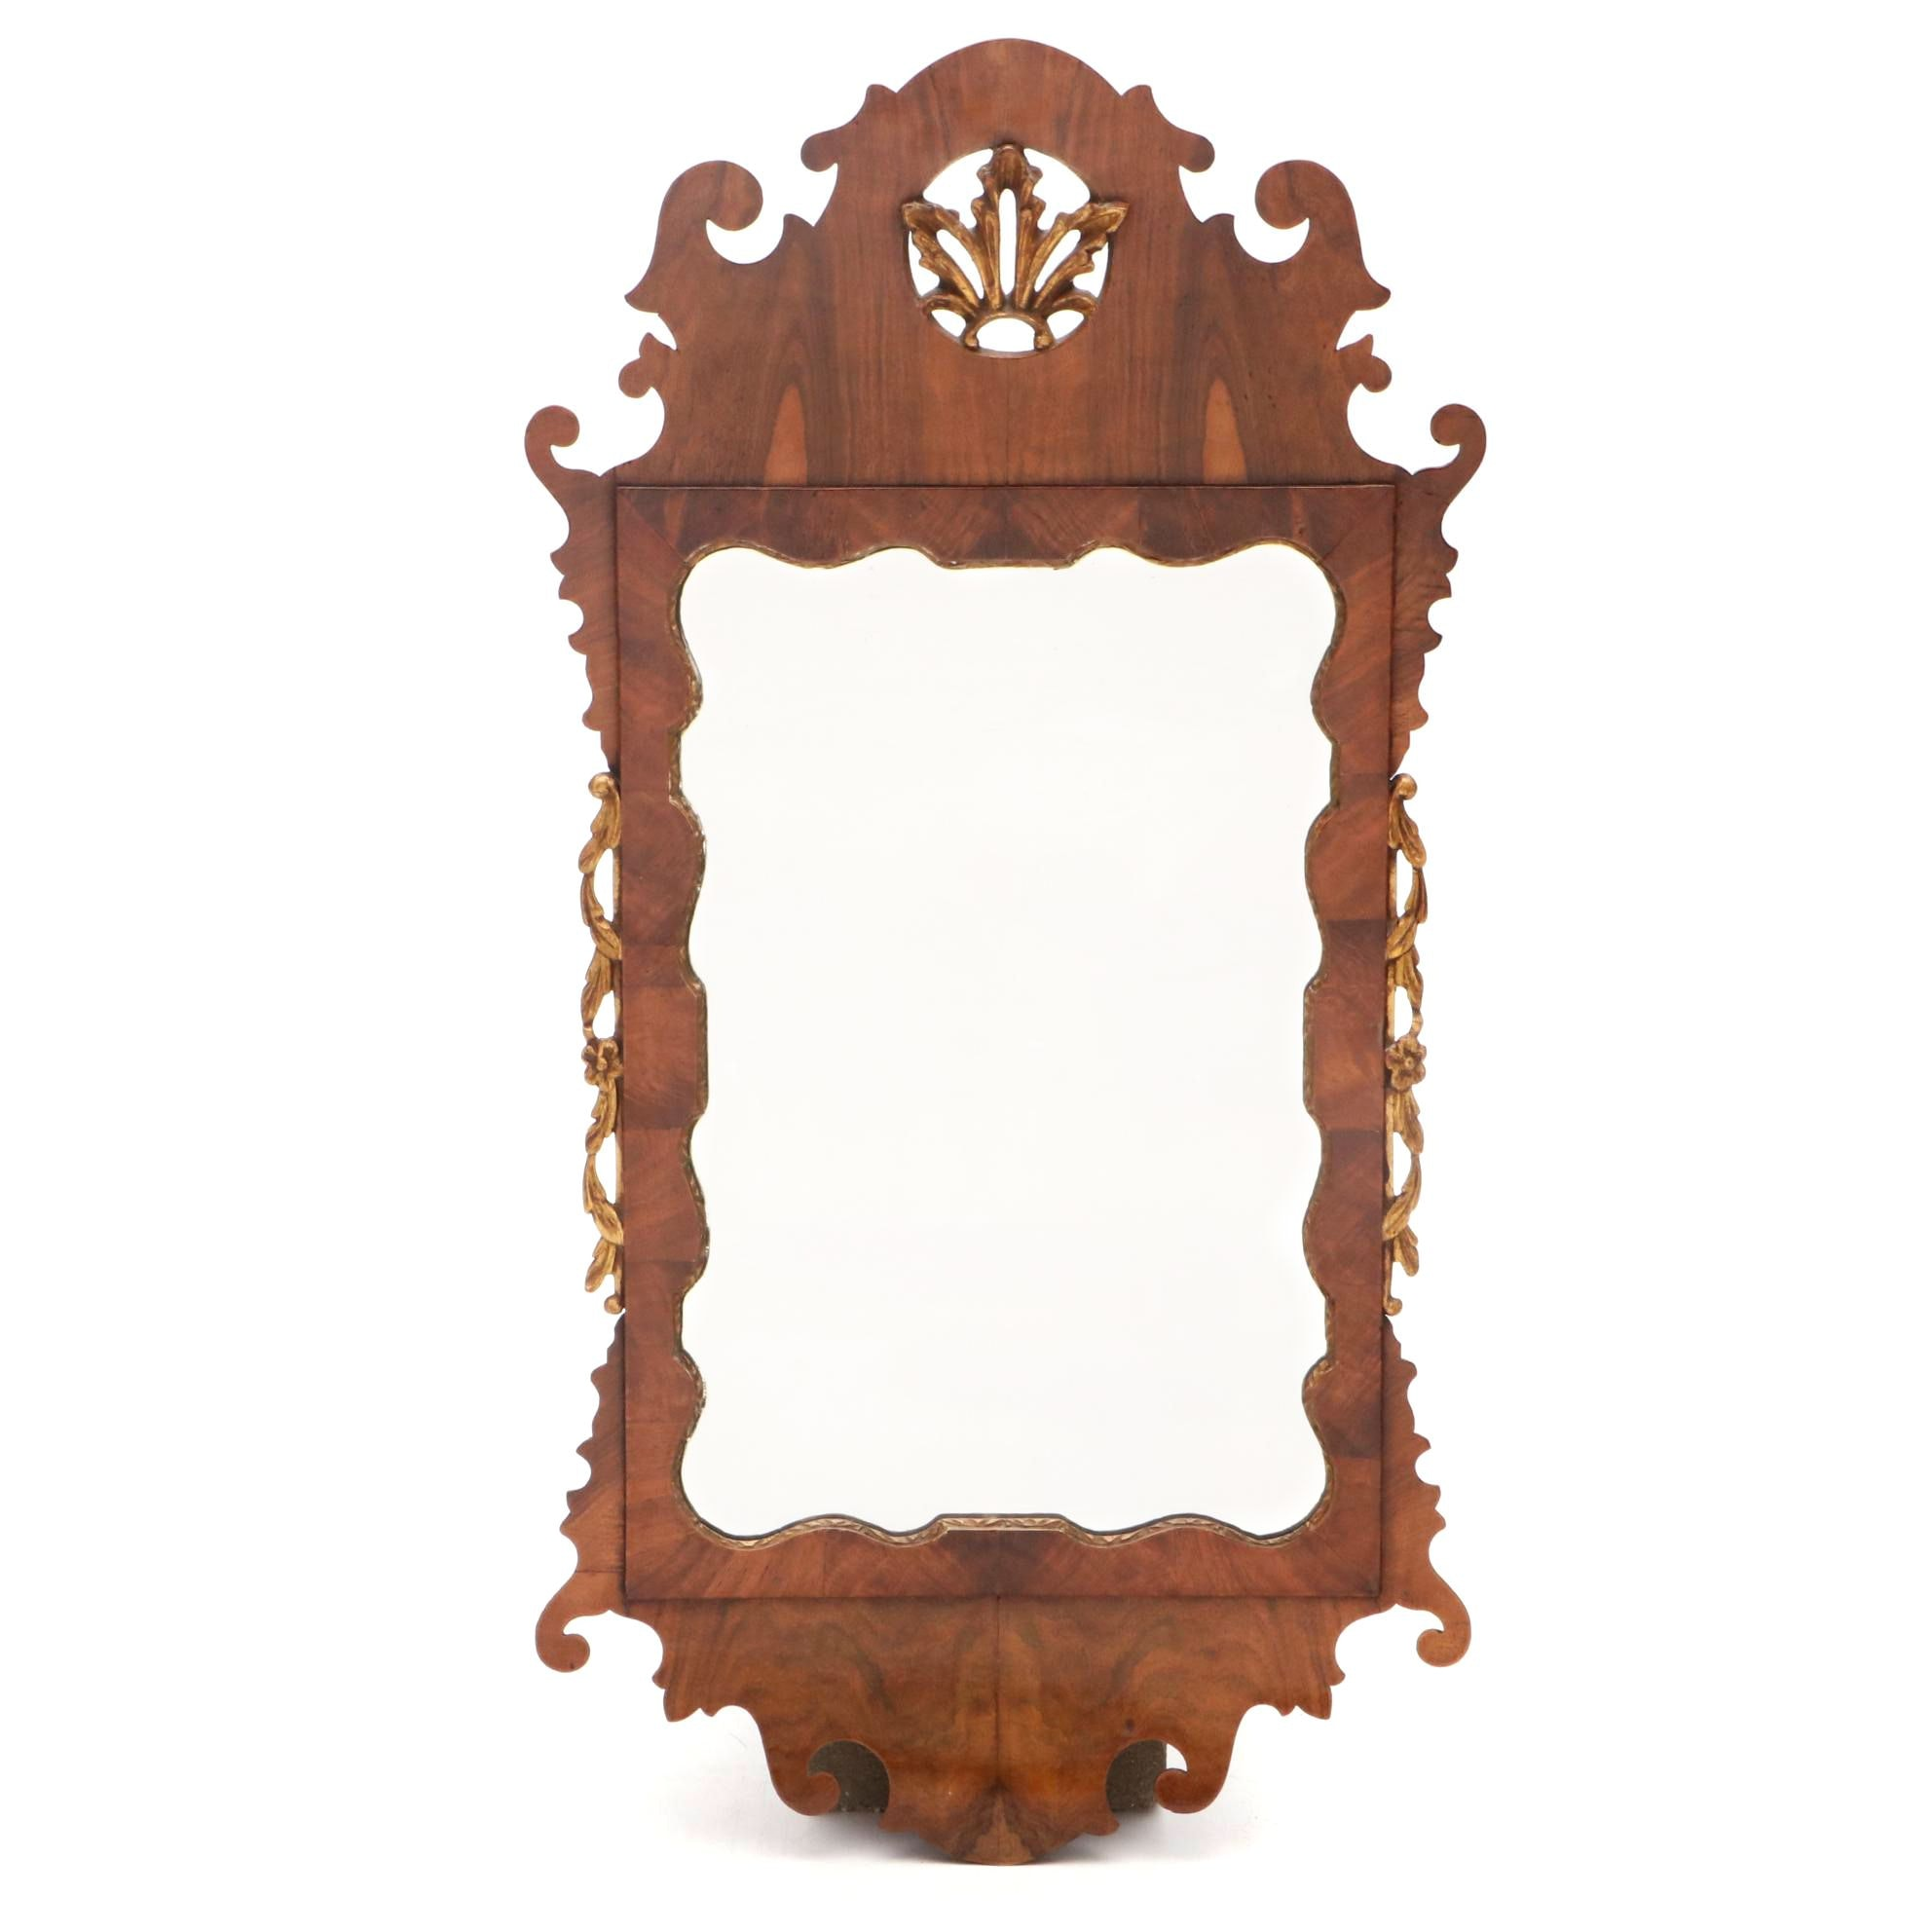 George III Era Walnut Parcel Gilt Mirror, 18th Century